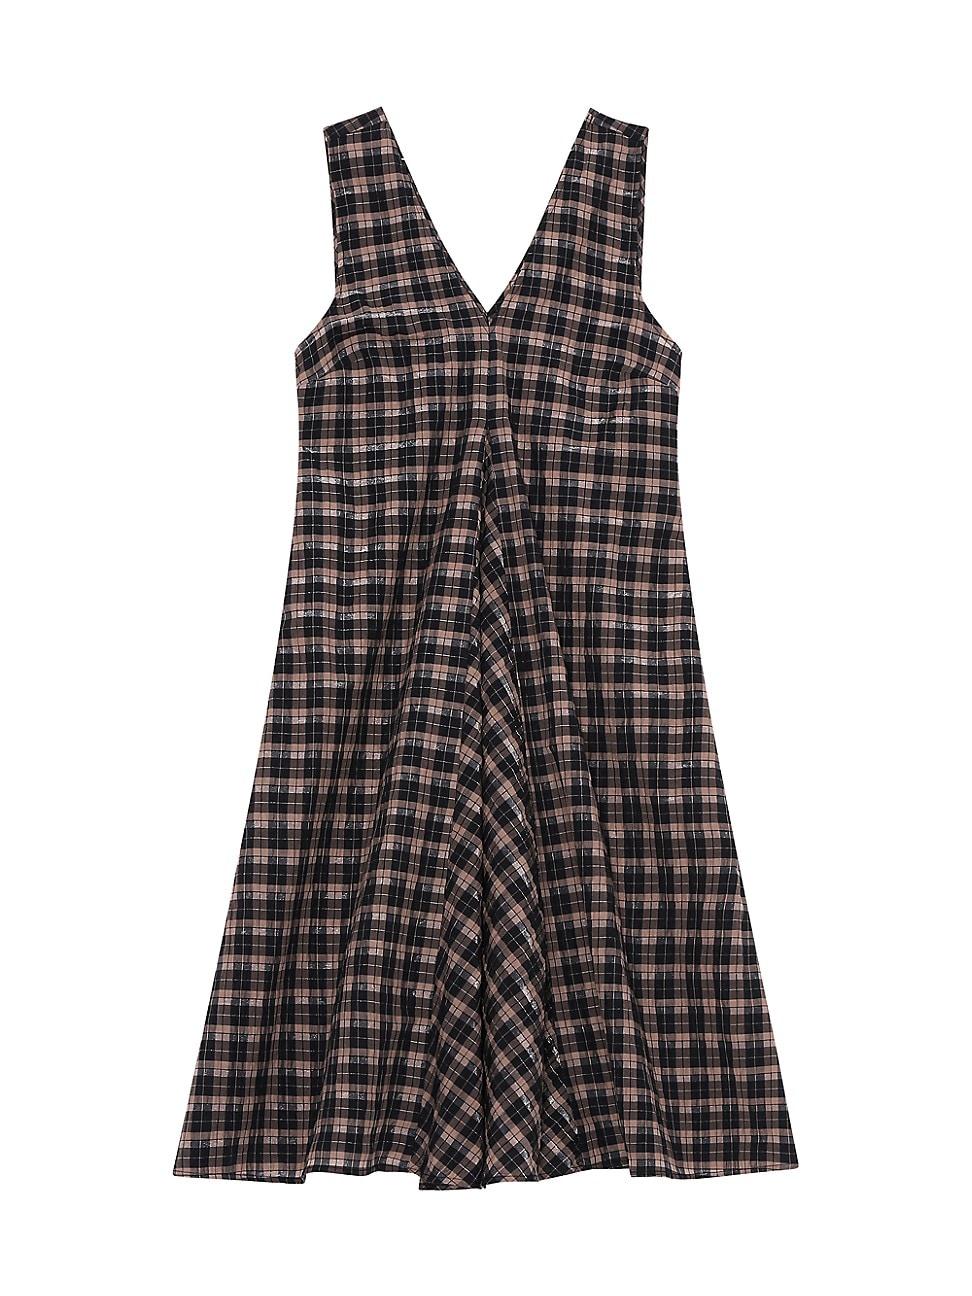 Ganni WOMEN'S SEERSUCKER CHECK SLEEVELESS MINI DRESS